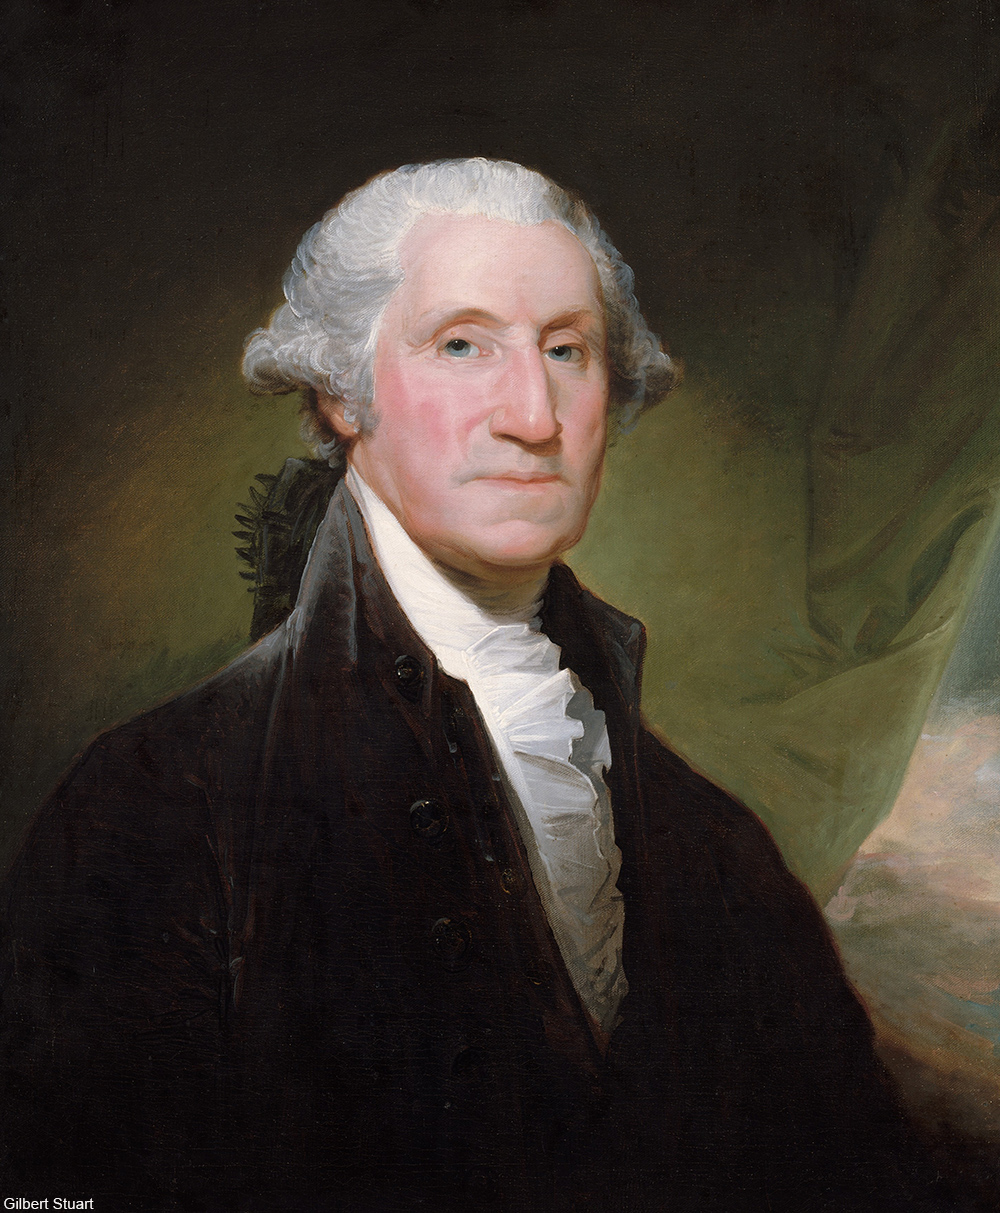 1795 painting of George Washington by Gilbert Stuart